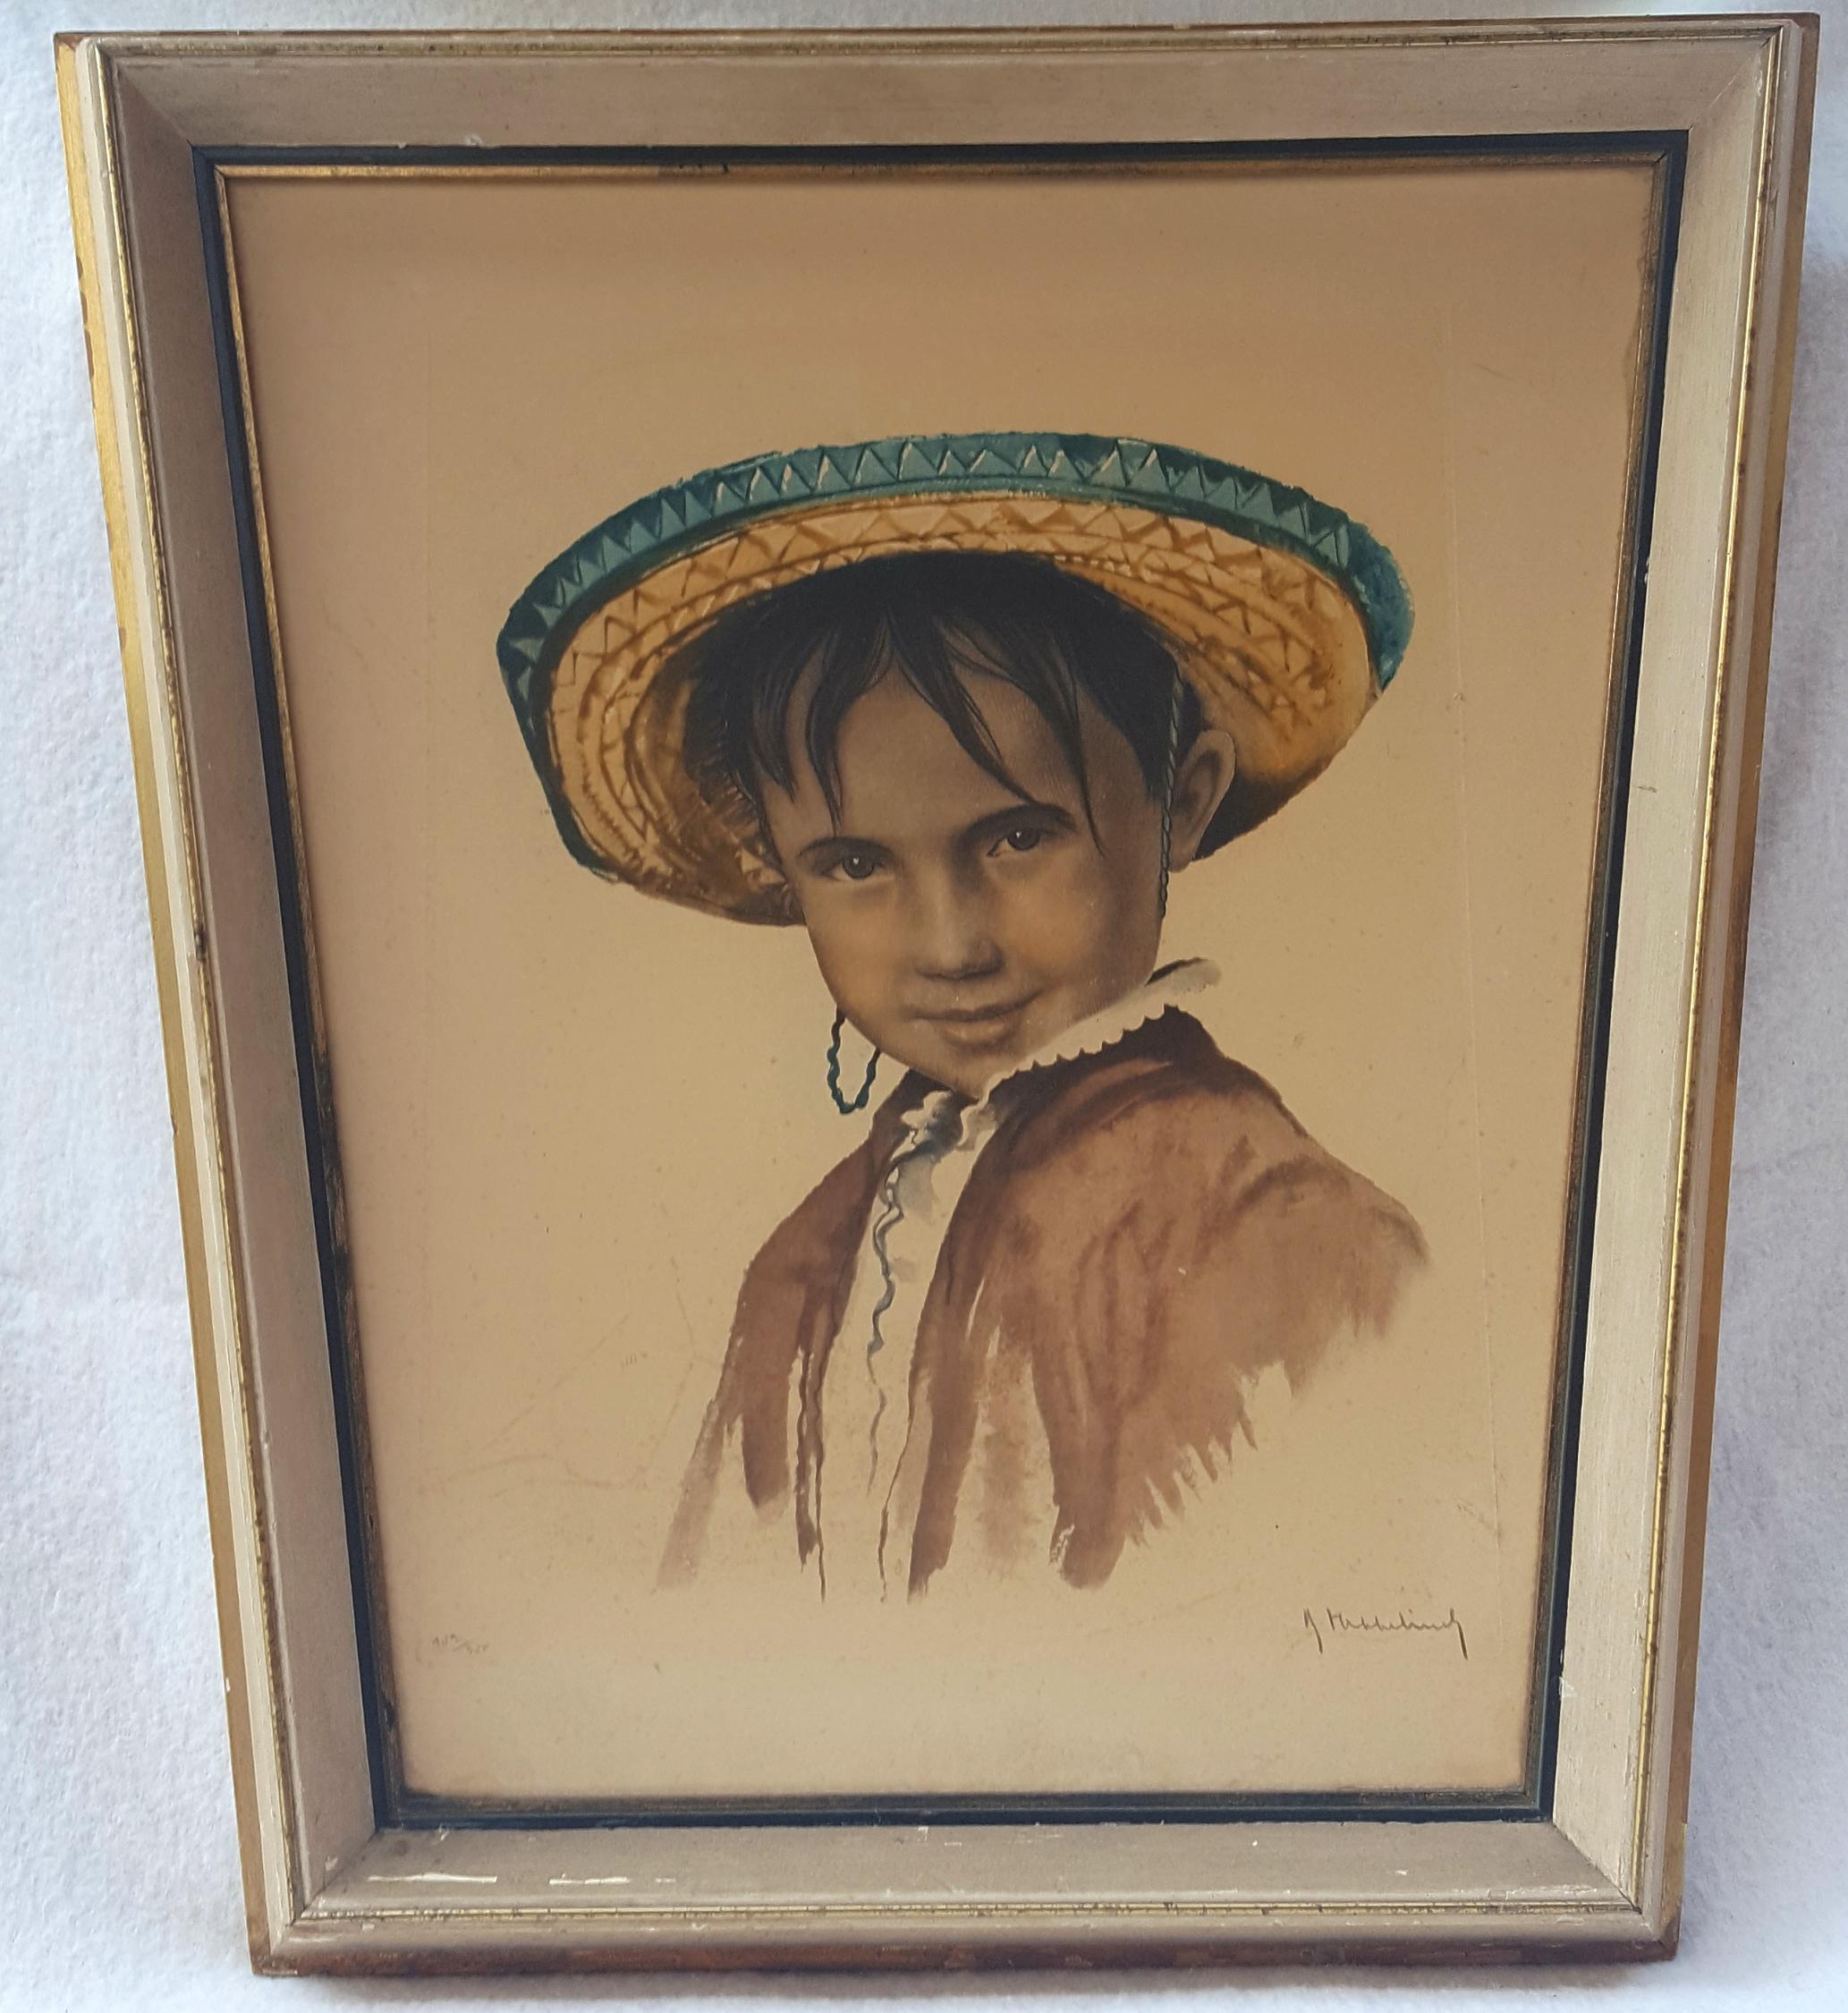 Lot 5 - Vintage Retro Aquatint Print Mexican Boy In Folk Costume